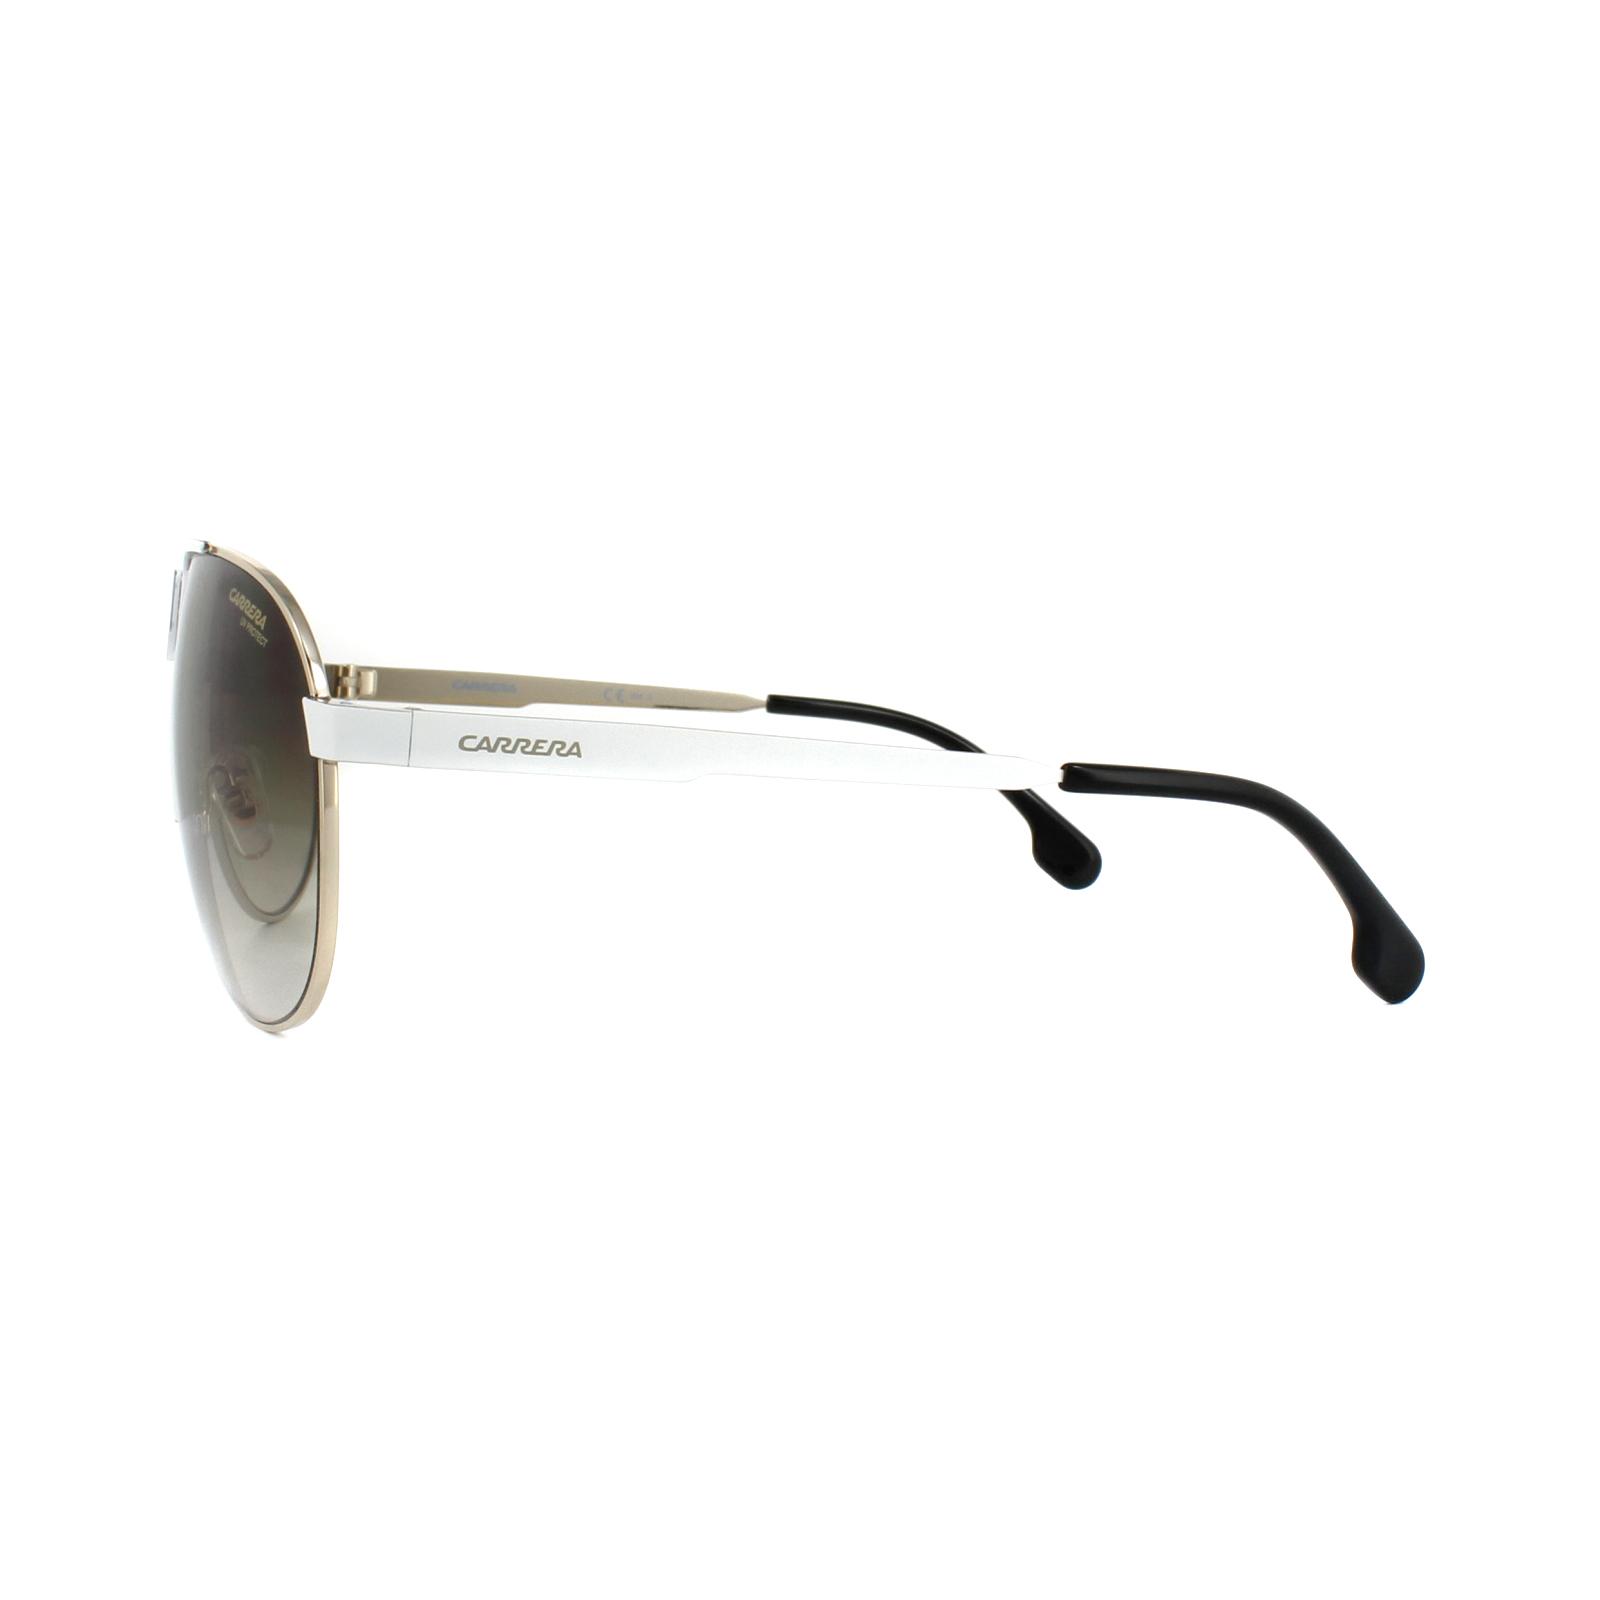 Cheap Carrera 1005 S Sunglasses - Discounted Sunglasses b4048e0d83